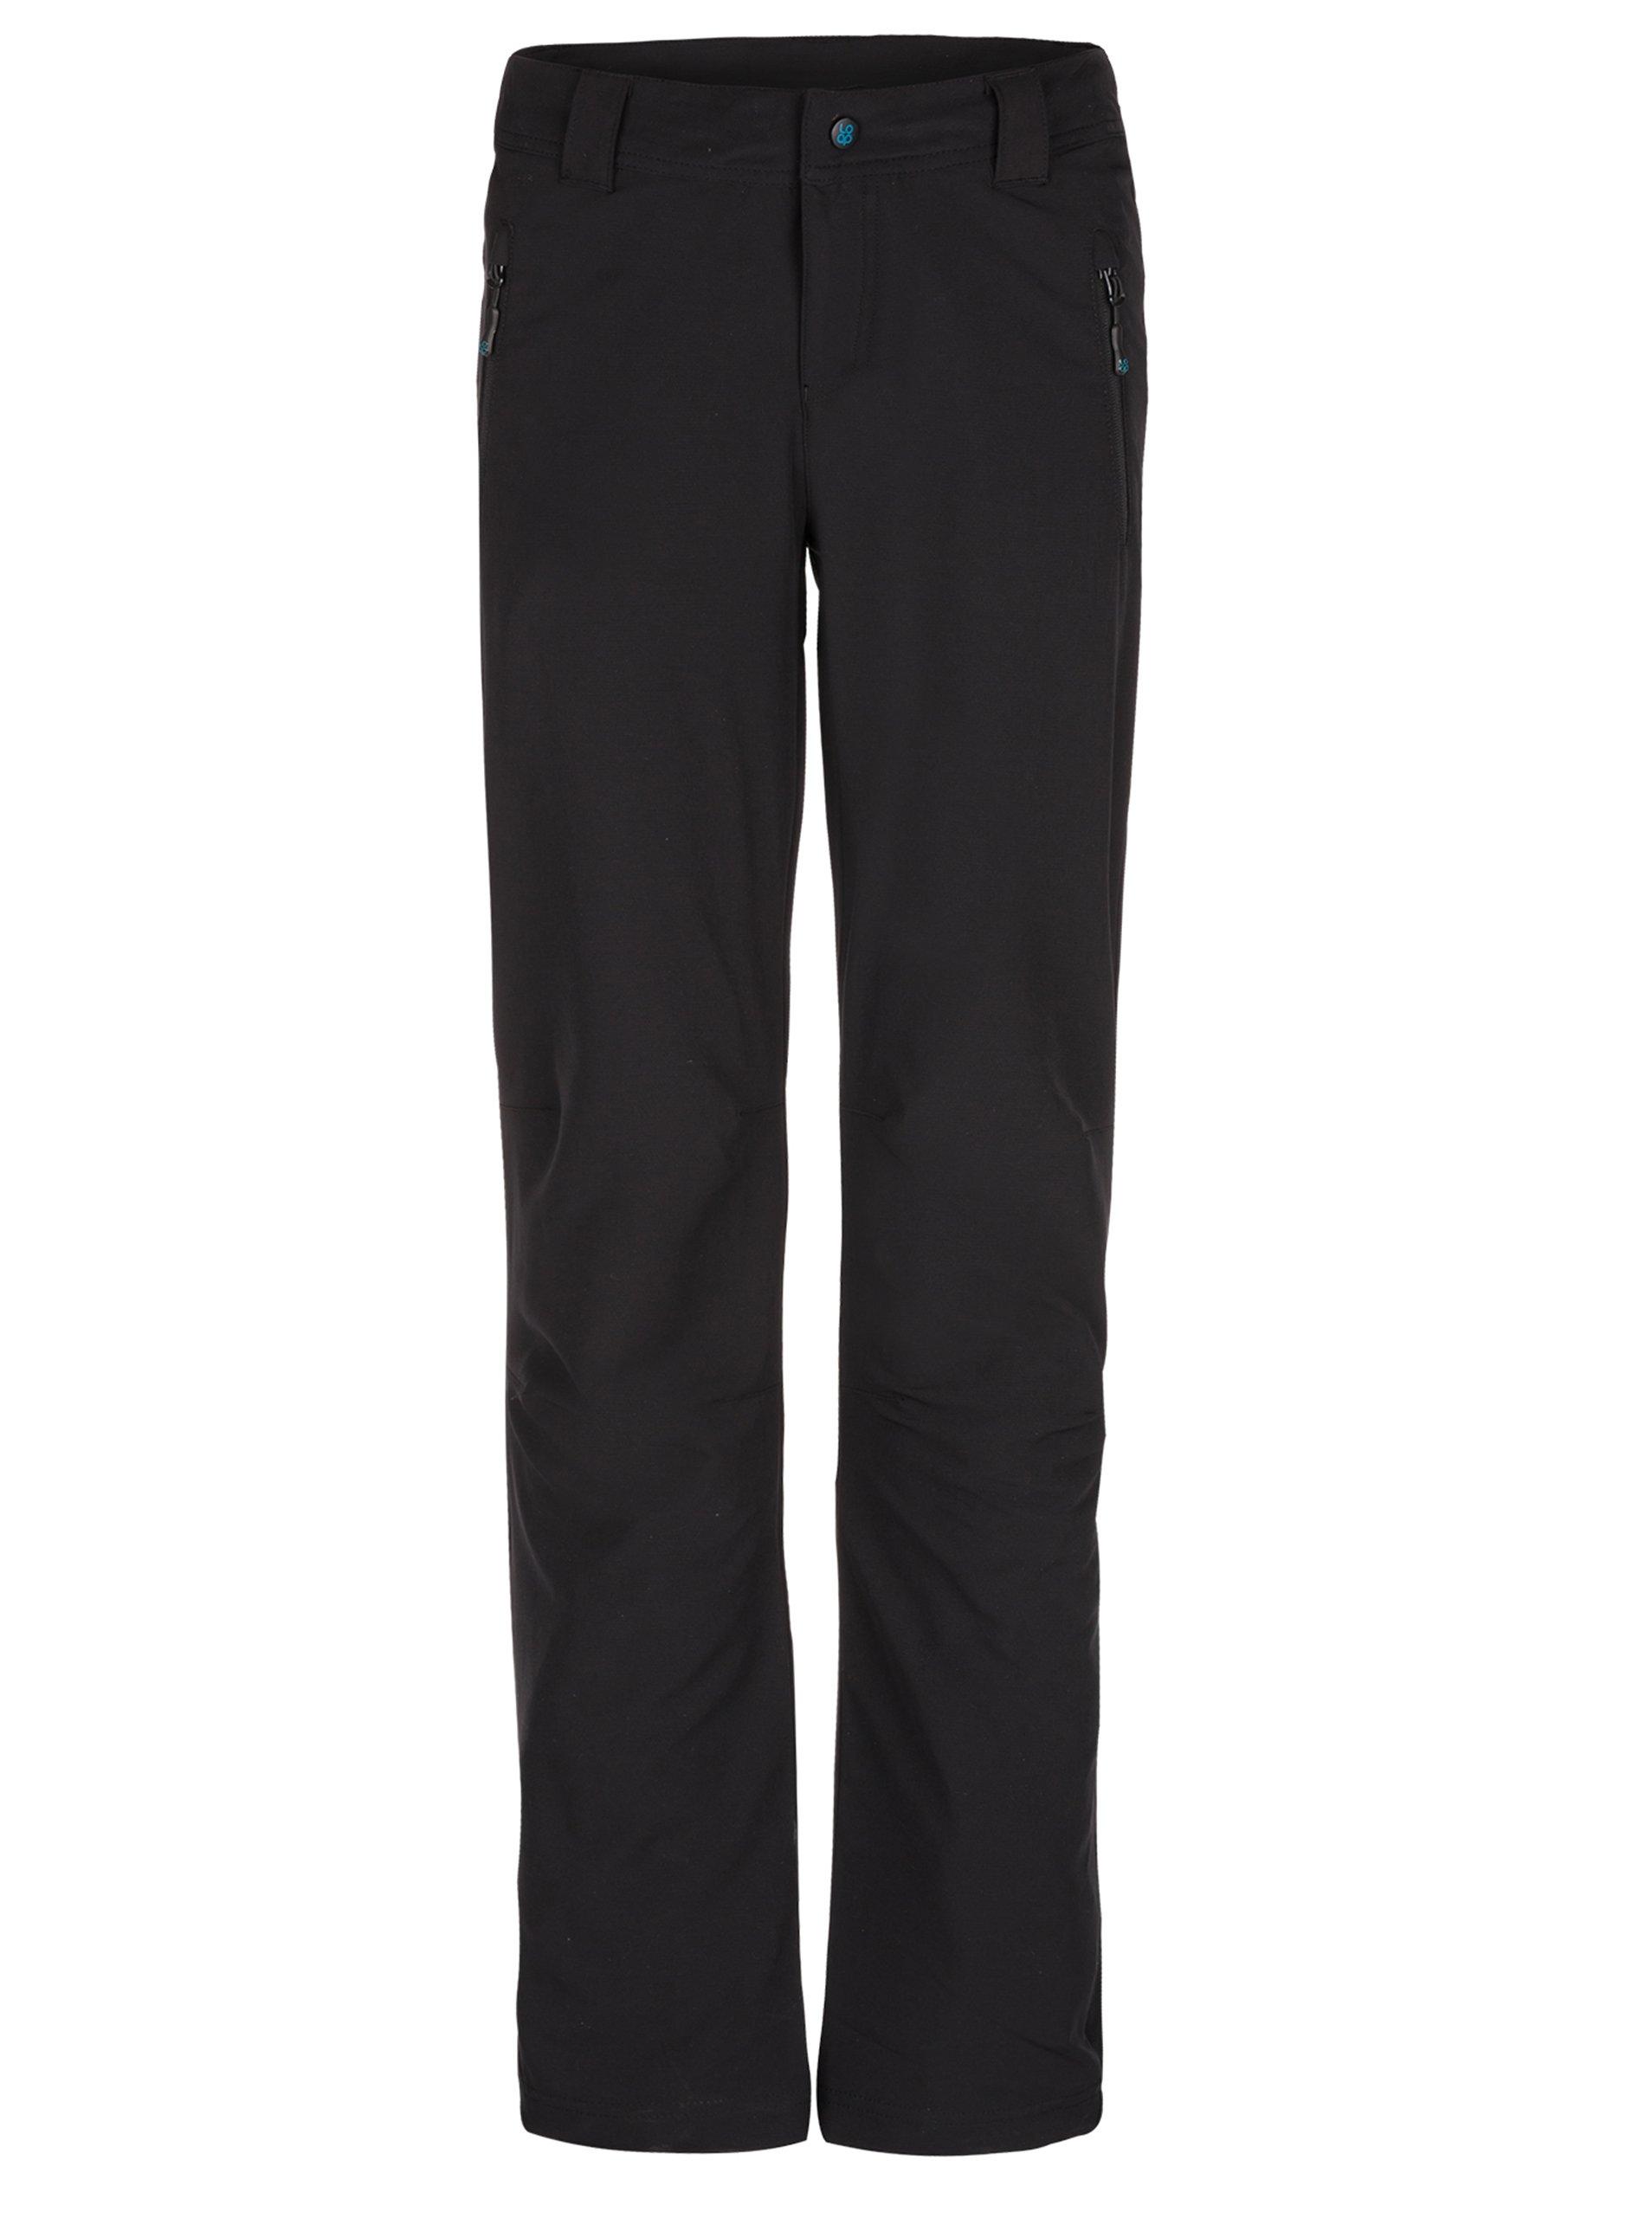 23b934651512 Čierne dámske funkčné softshellové nohavice LOAP Urik